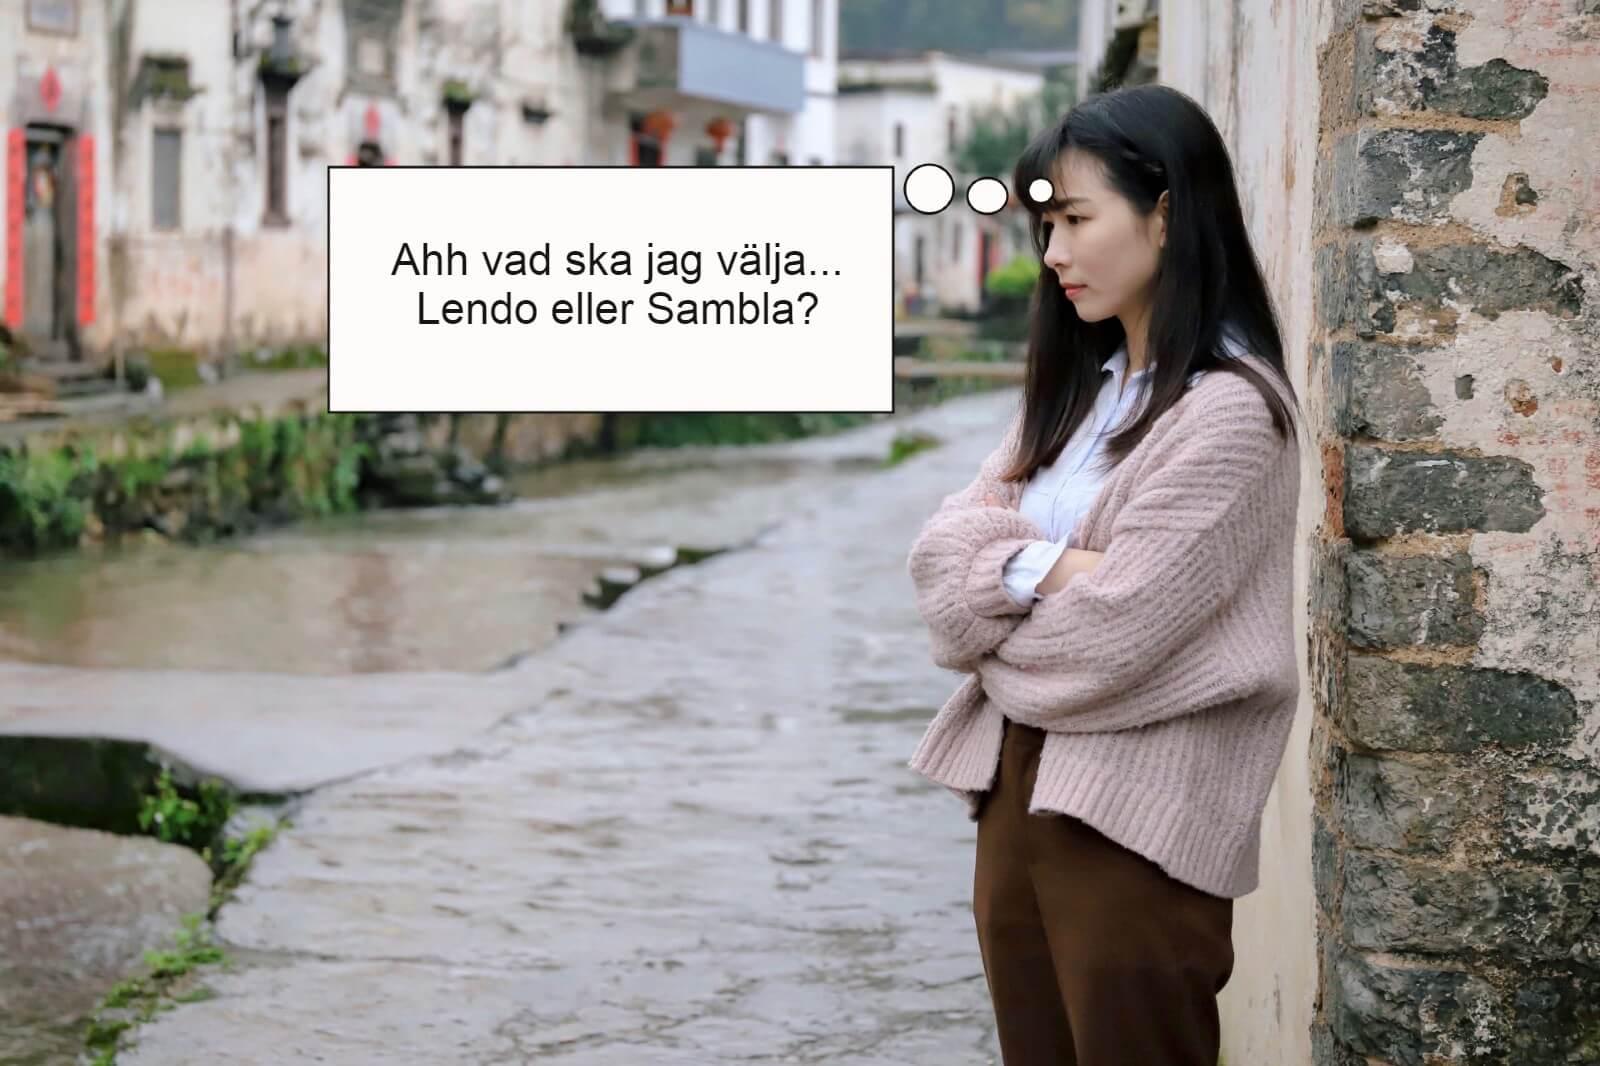 Lendo eller Sambla